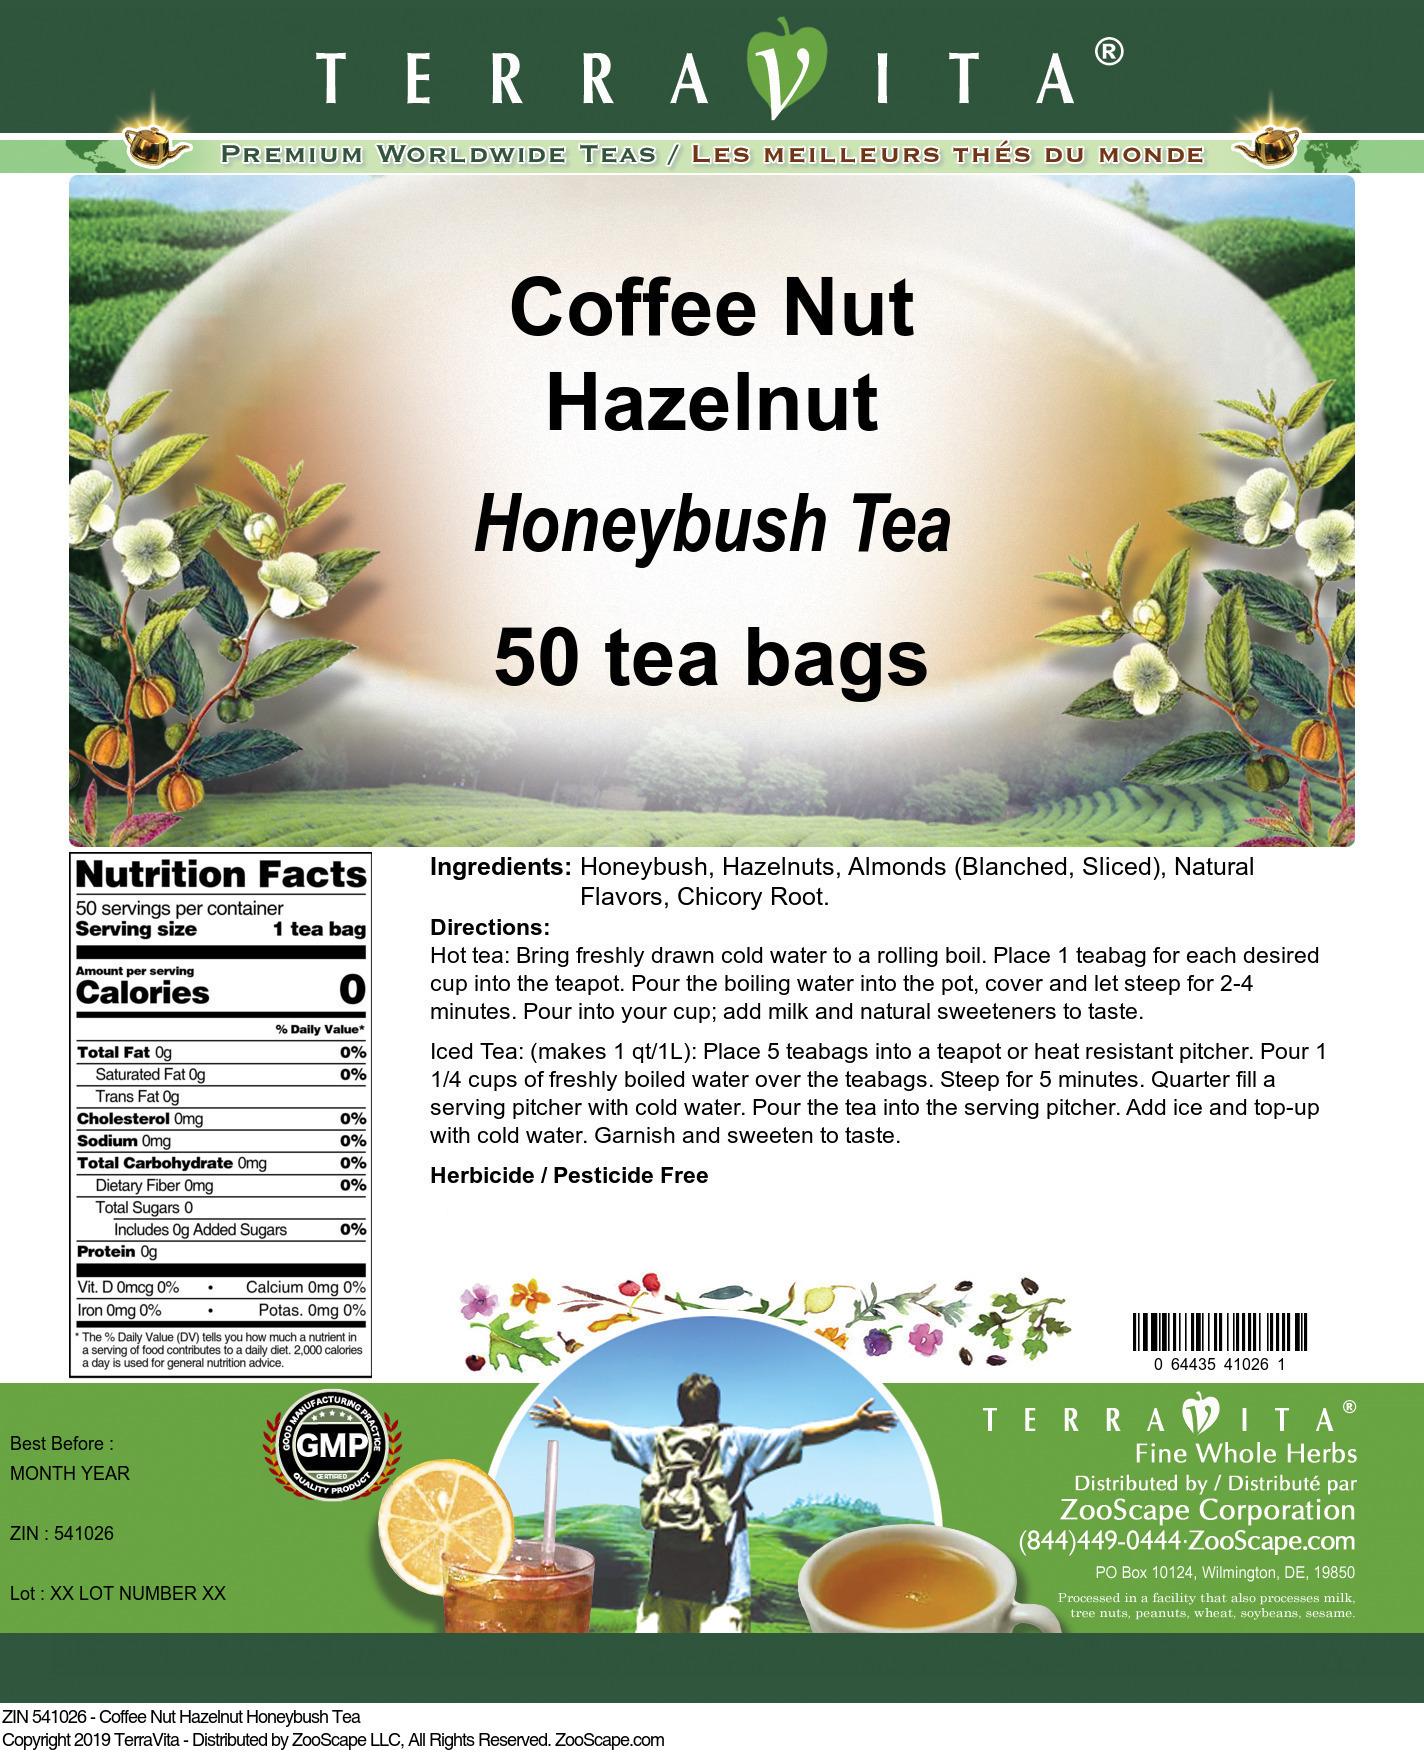 Coffee Nut Hazelnut Honeybush Tea